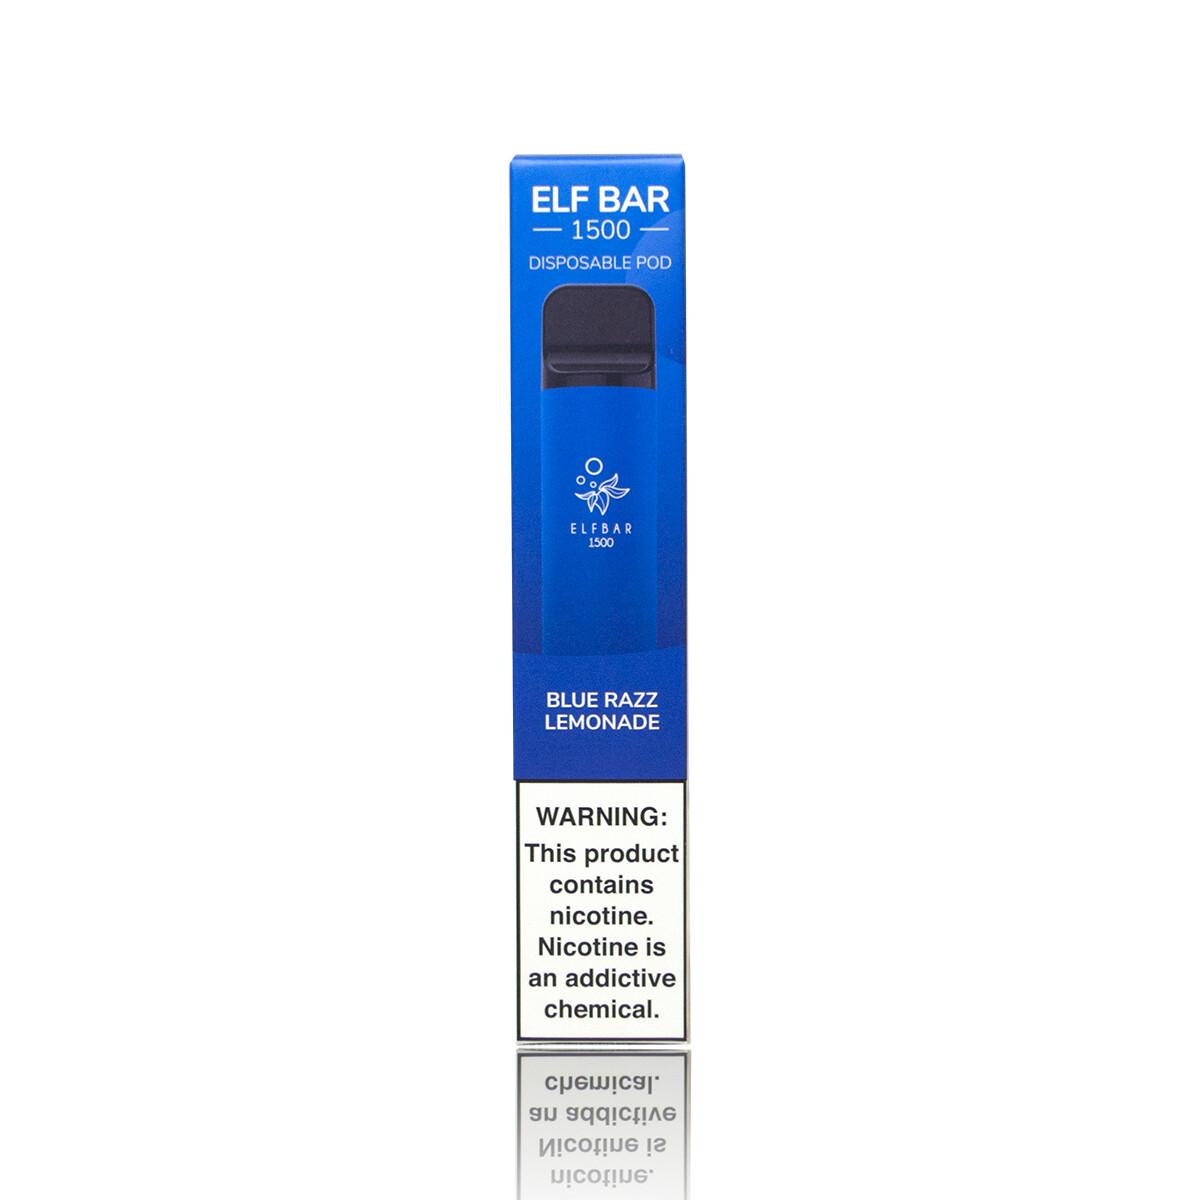 ELF BAR 1500: BLUE RAZZ LEMONADE